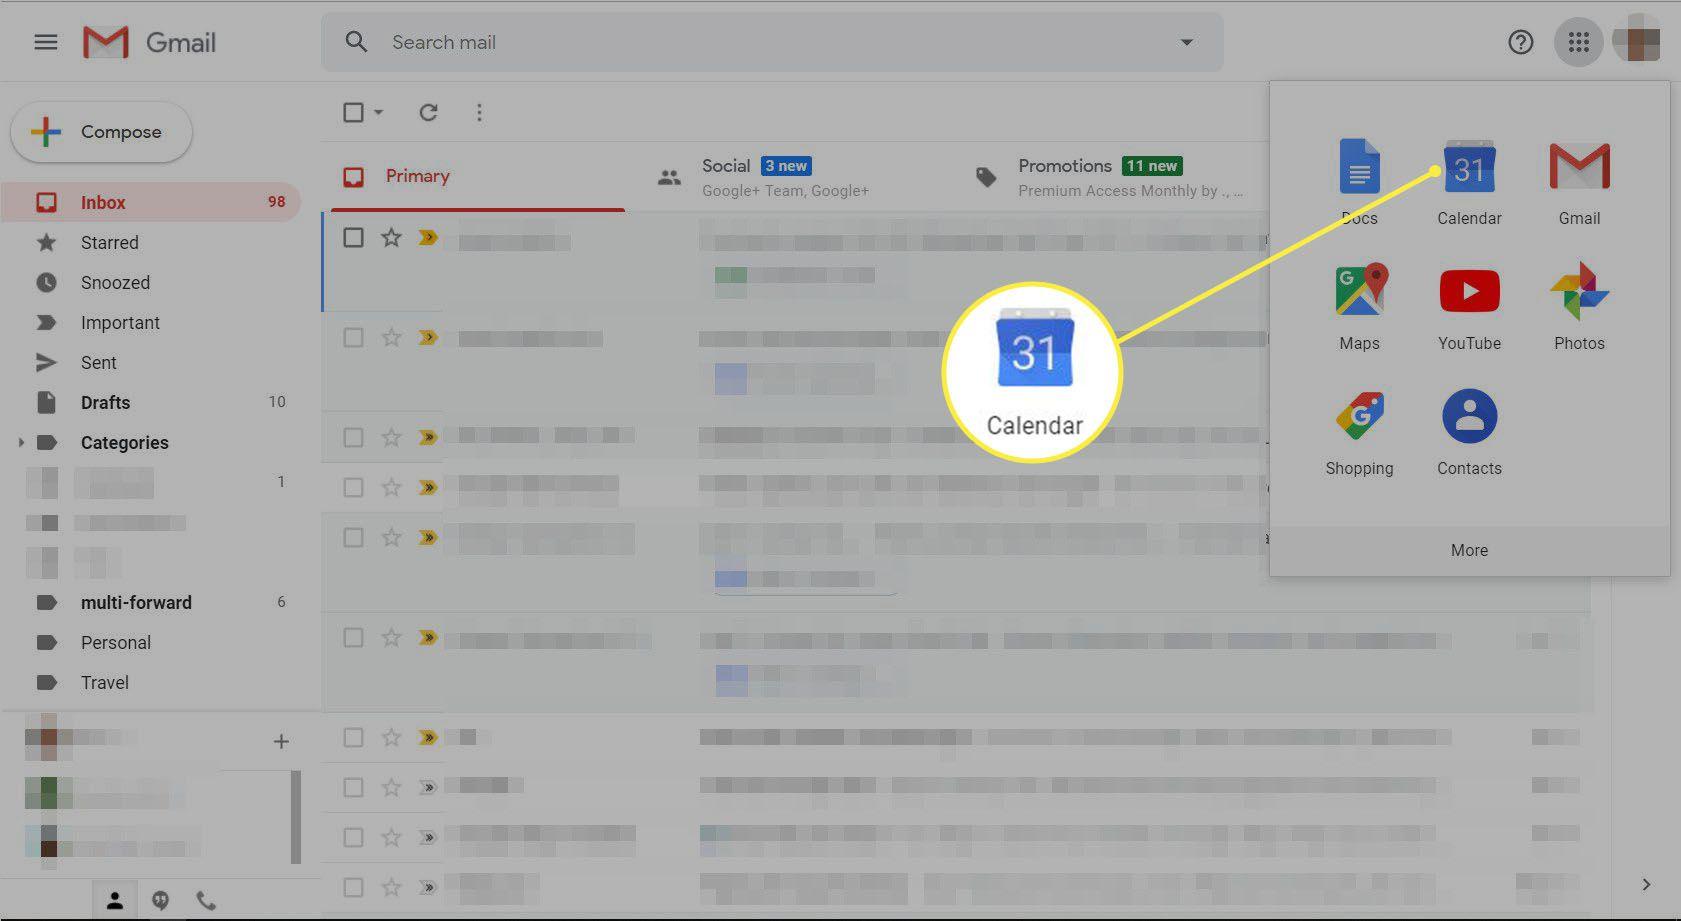 Gmail with Google menu displayed.